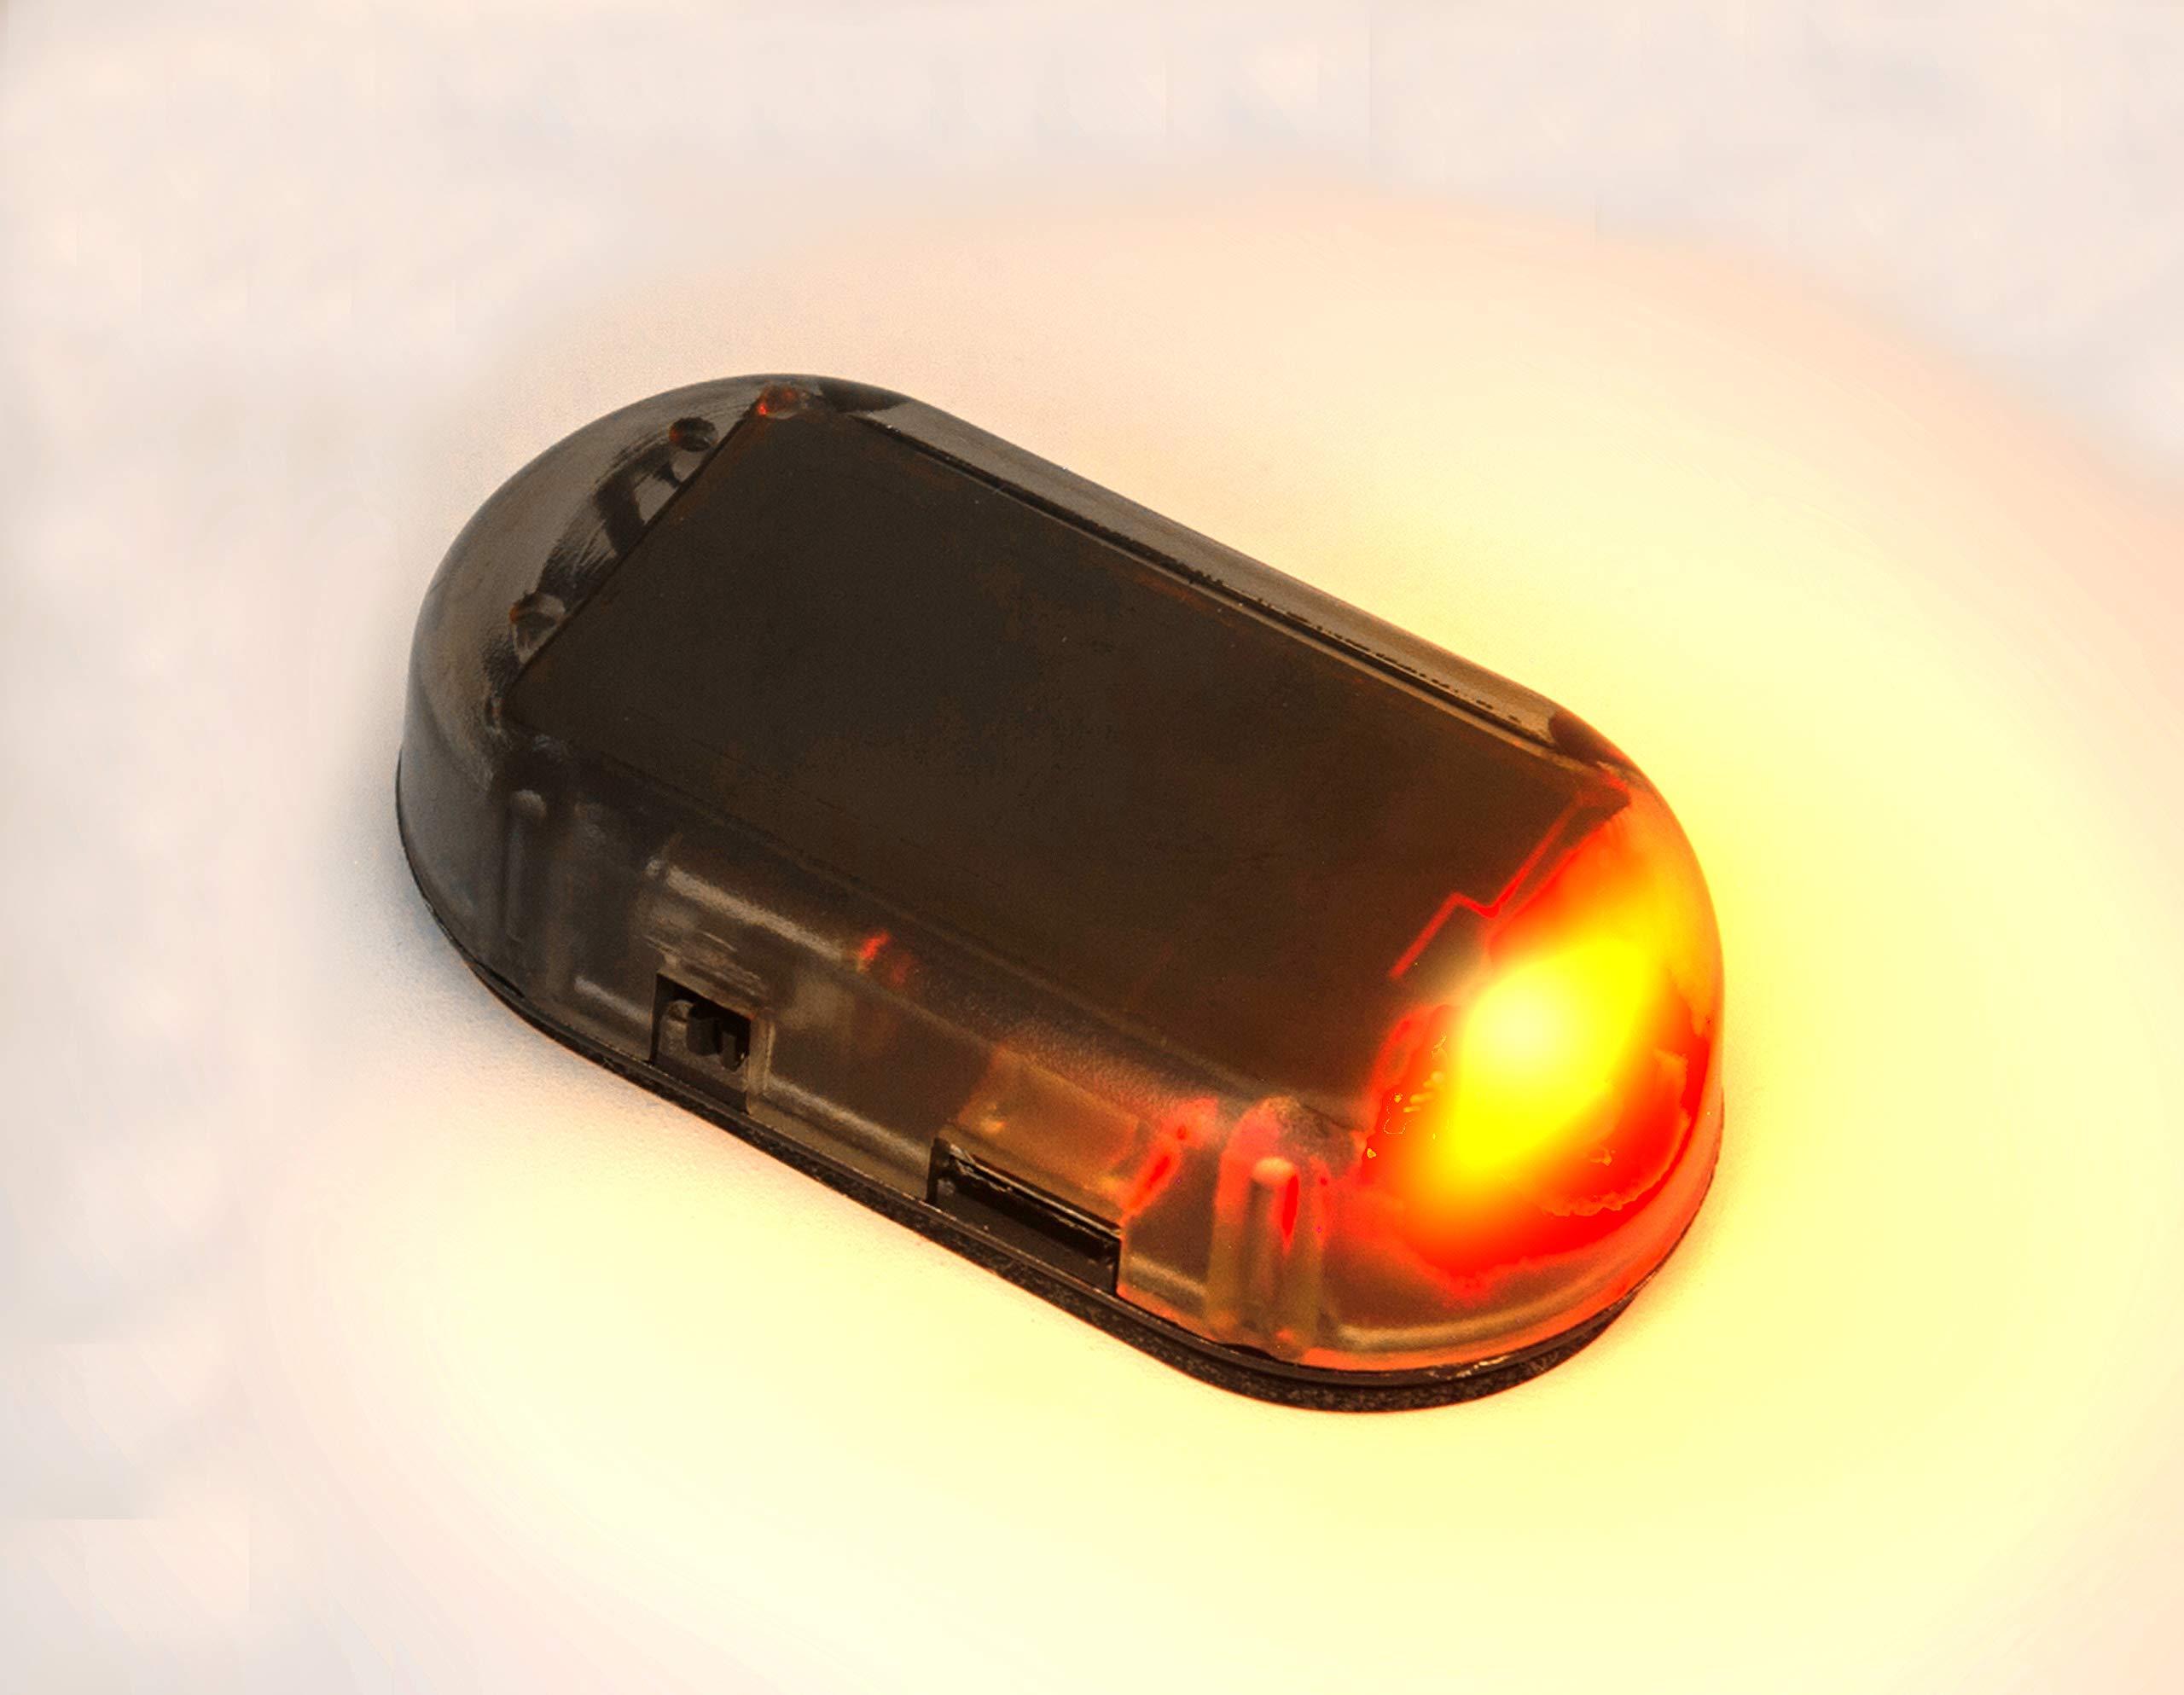 PerfecTech Car Solar Power Simulated Dummy Alarm Warning Anti-Theft LED Flashing Security Light Fake Lamp Red